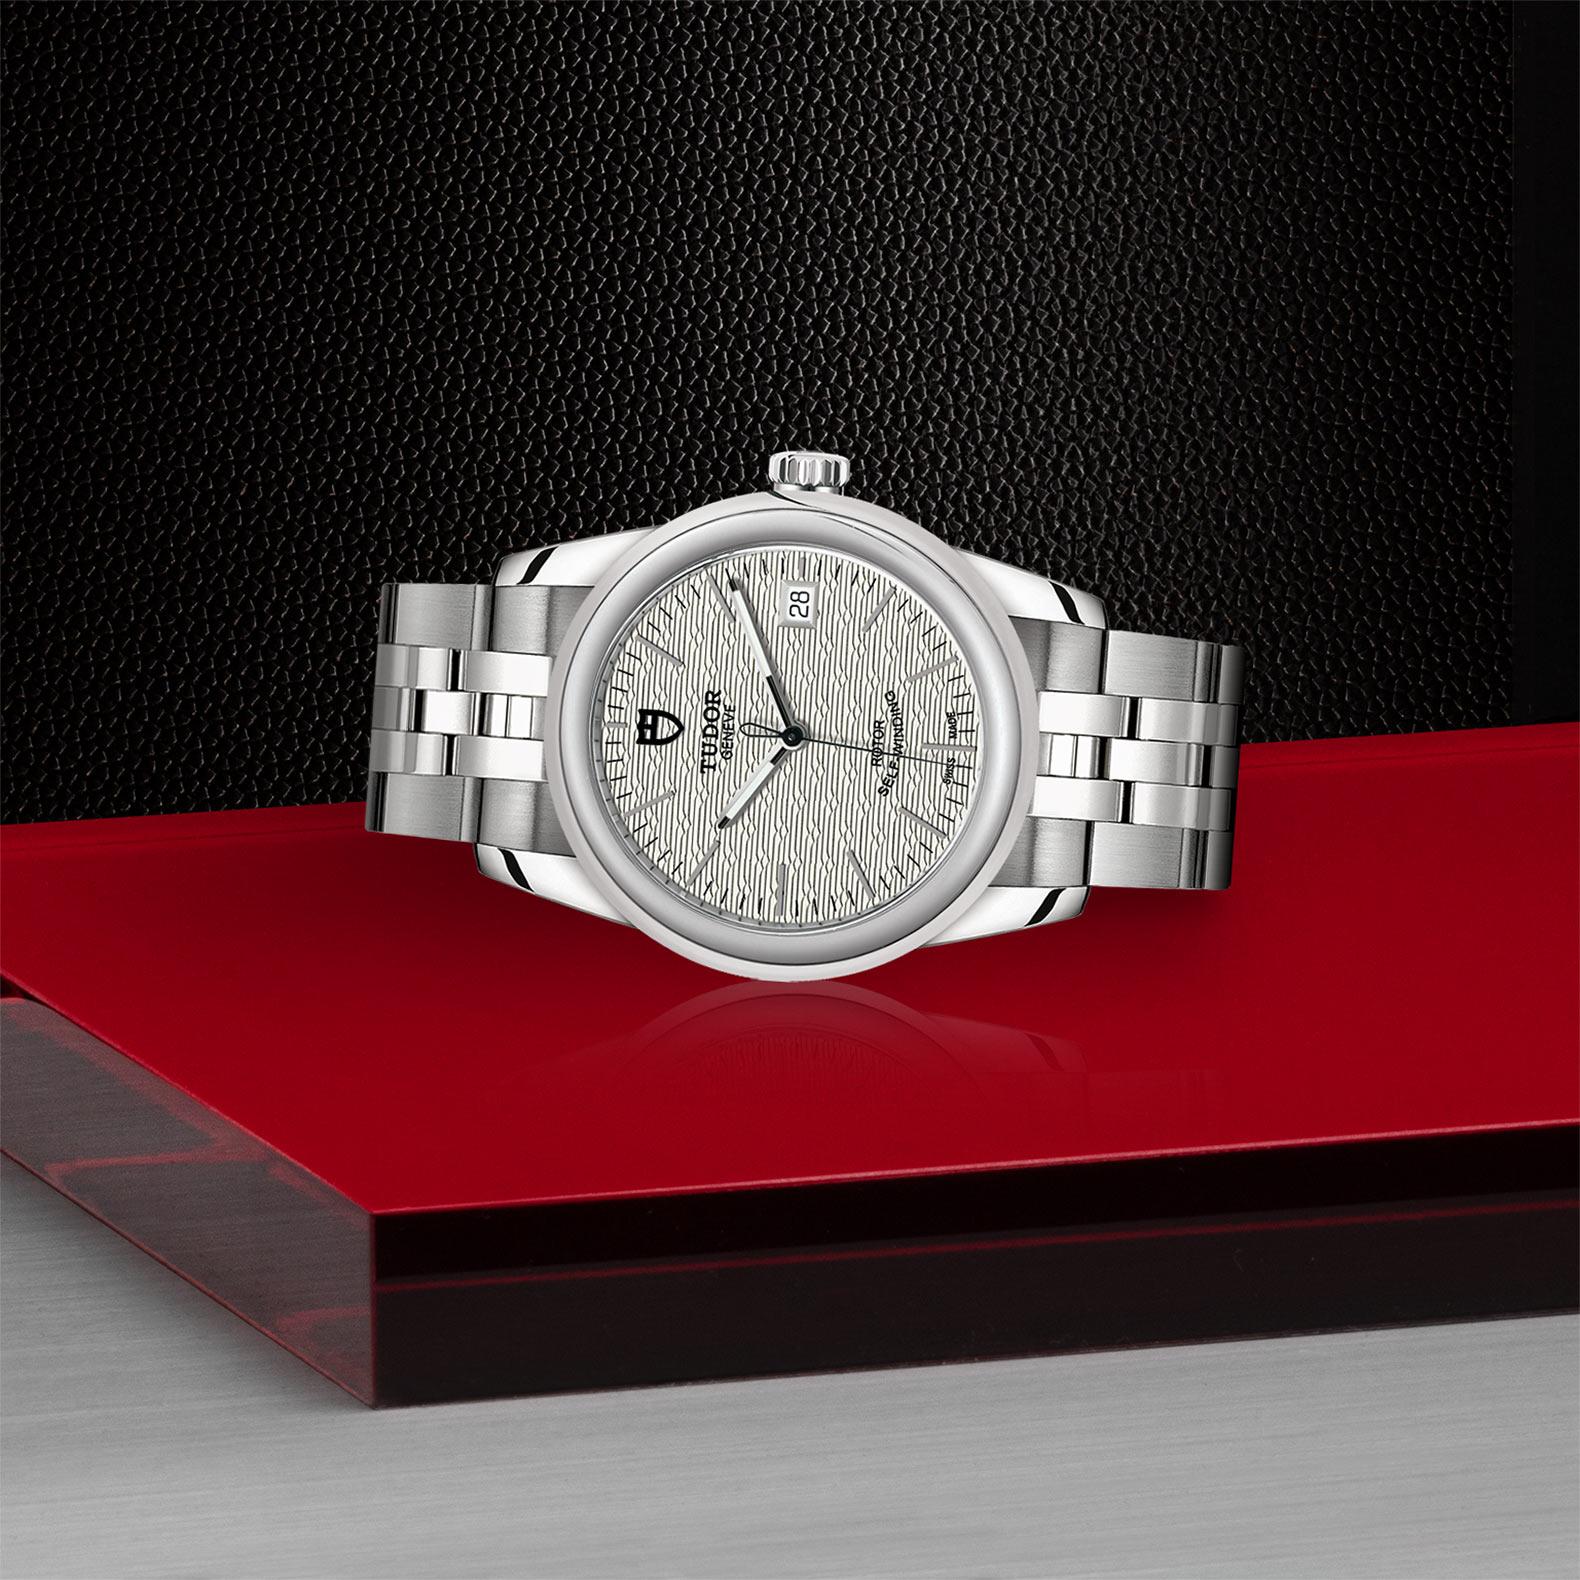 TUDOR Glamour Date - M55000-0003